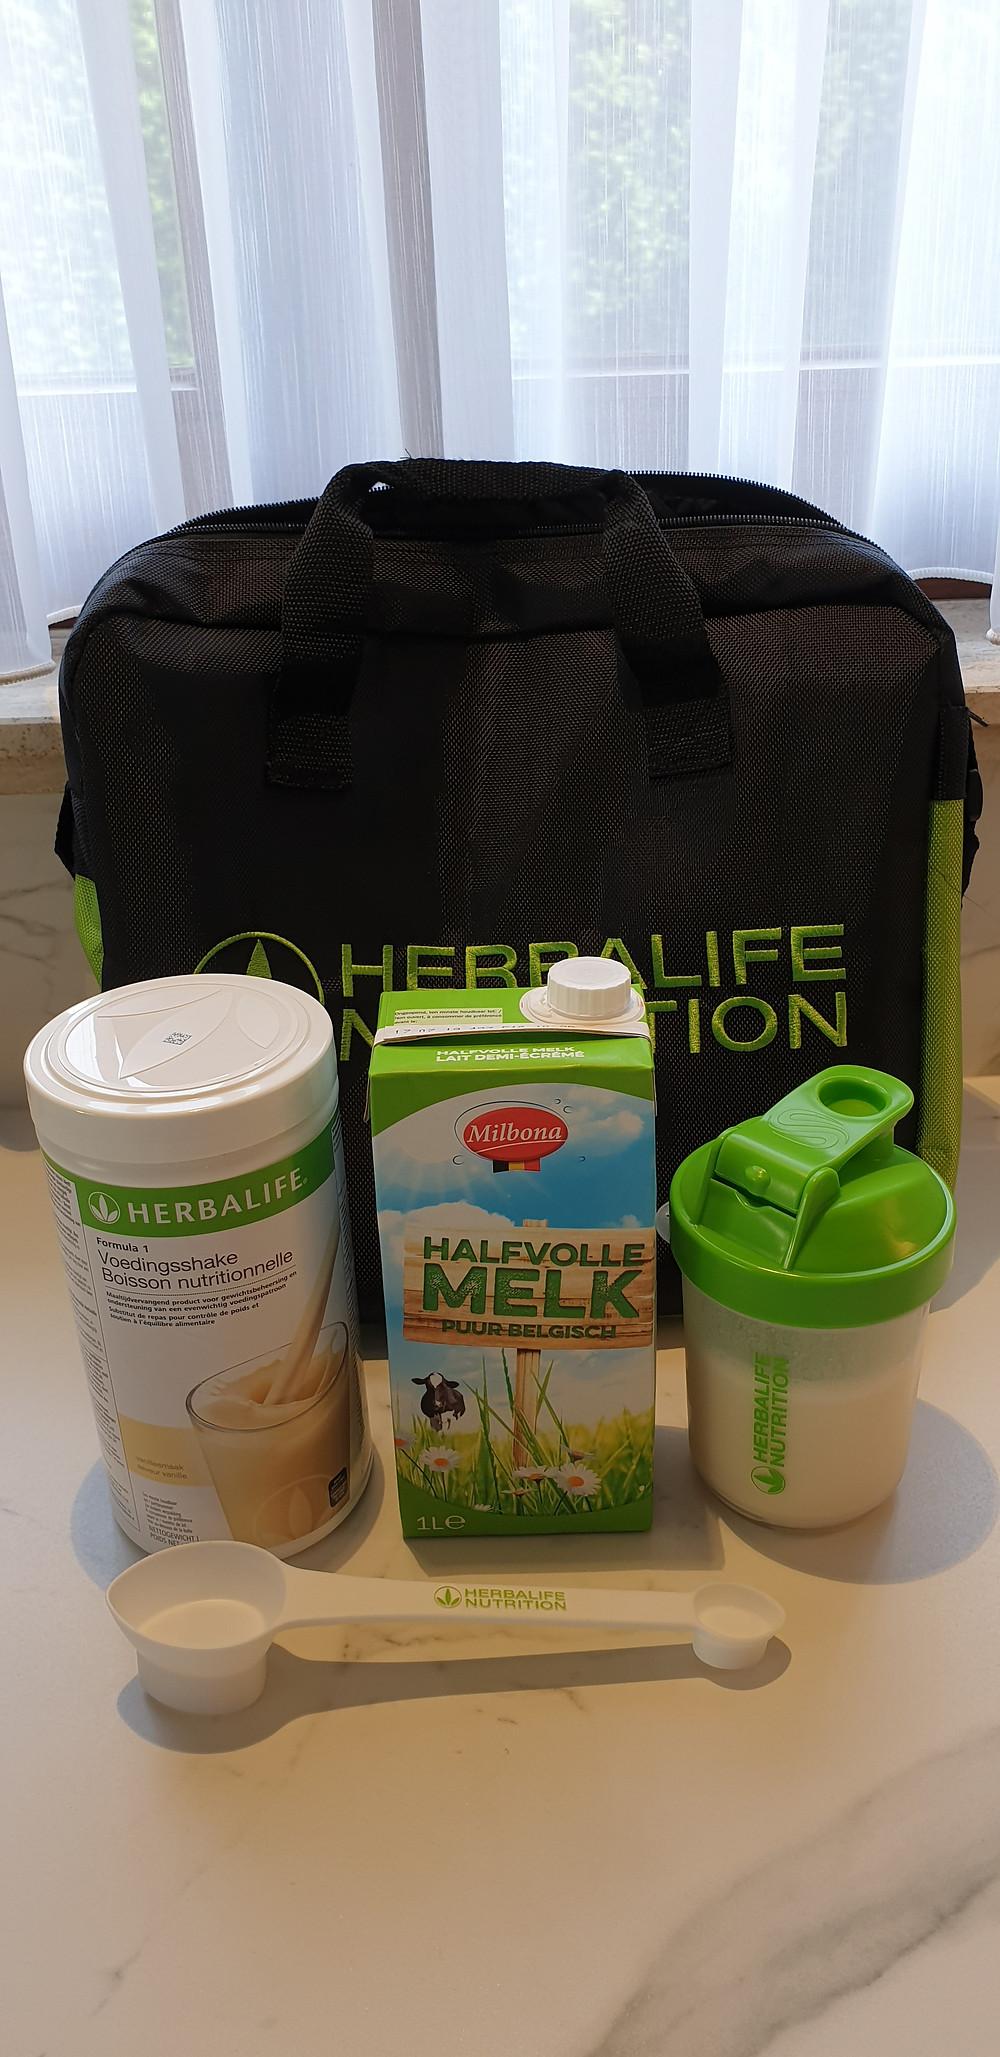 Formula 1 Nutritional shake + 300 ml. Cow milk + Shaker + Measuring spoon.